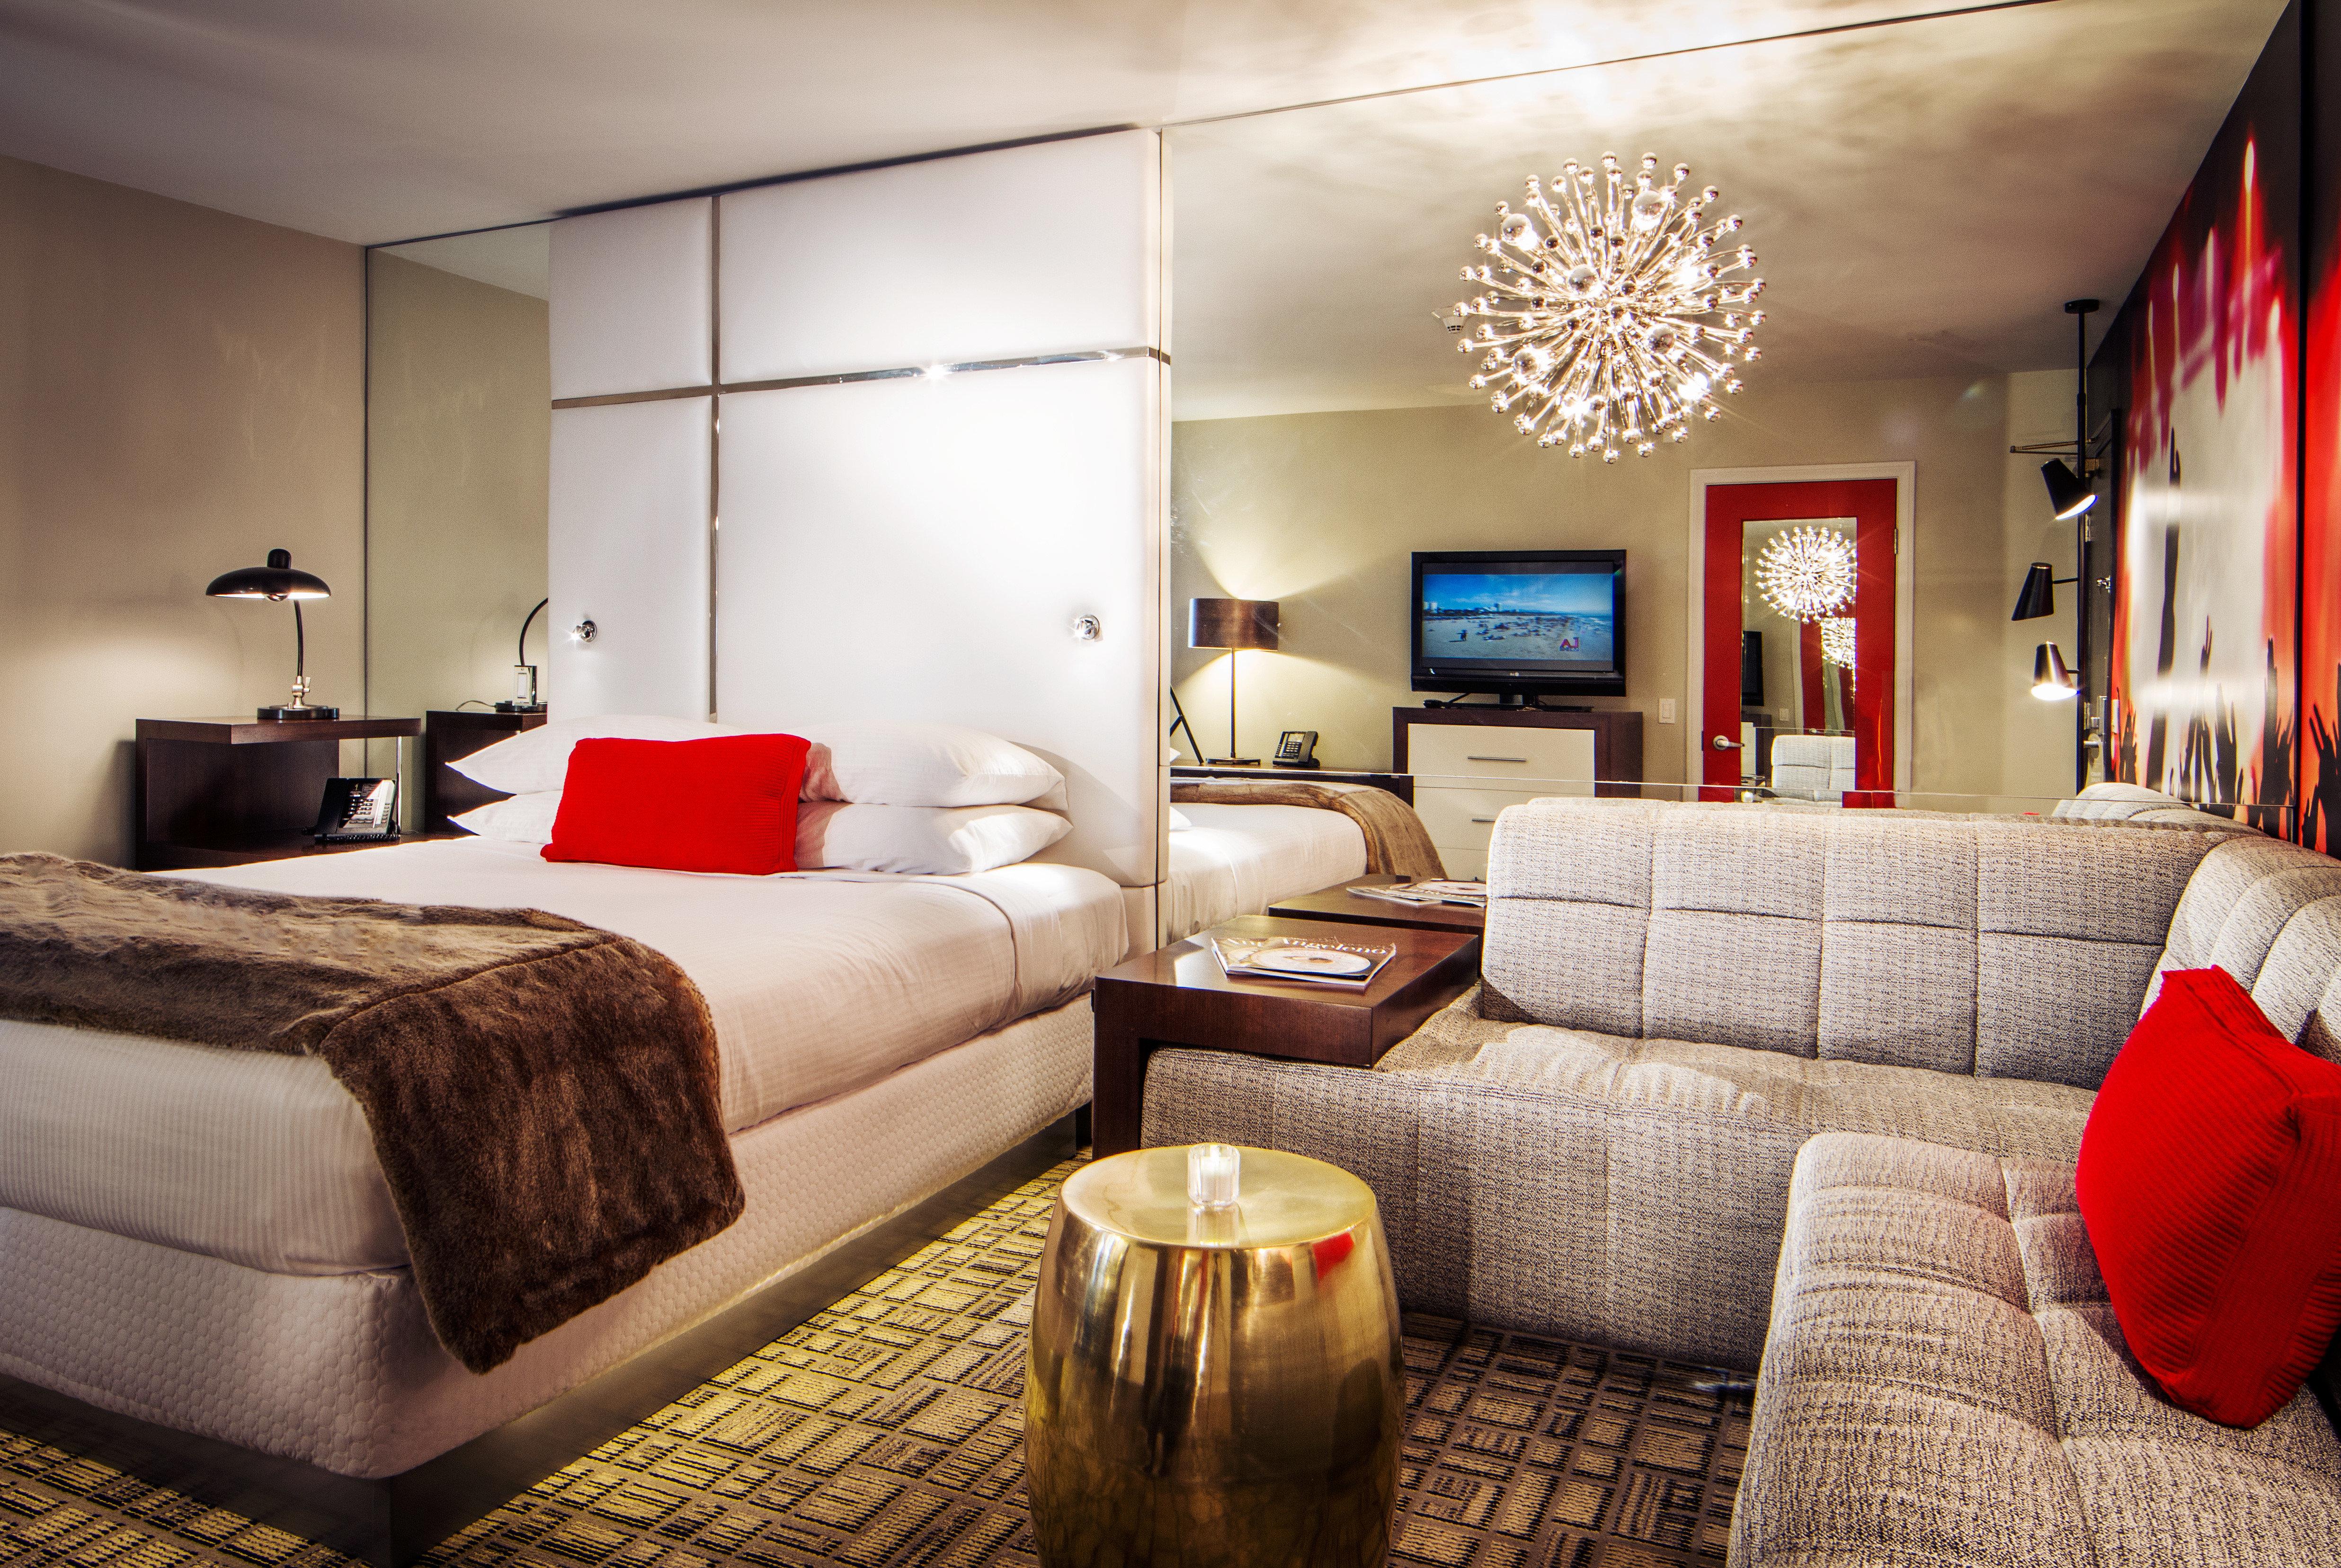 Bedroom Hip Modern Party sofa property living room home Suite cottage flat